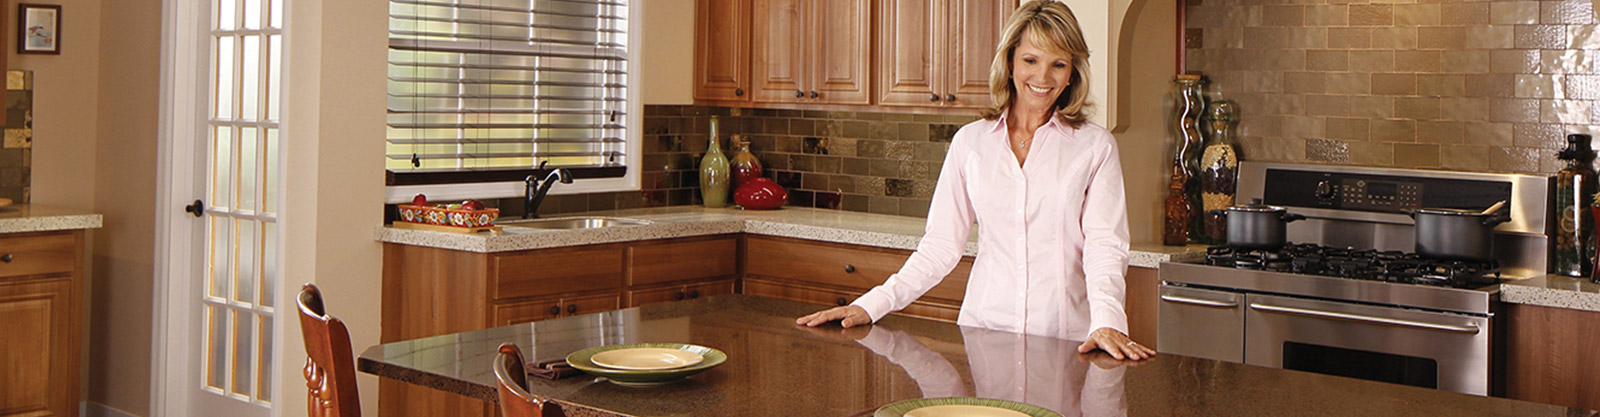 kitchen renovation franchise opportunities